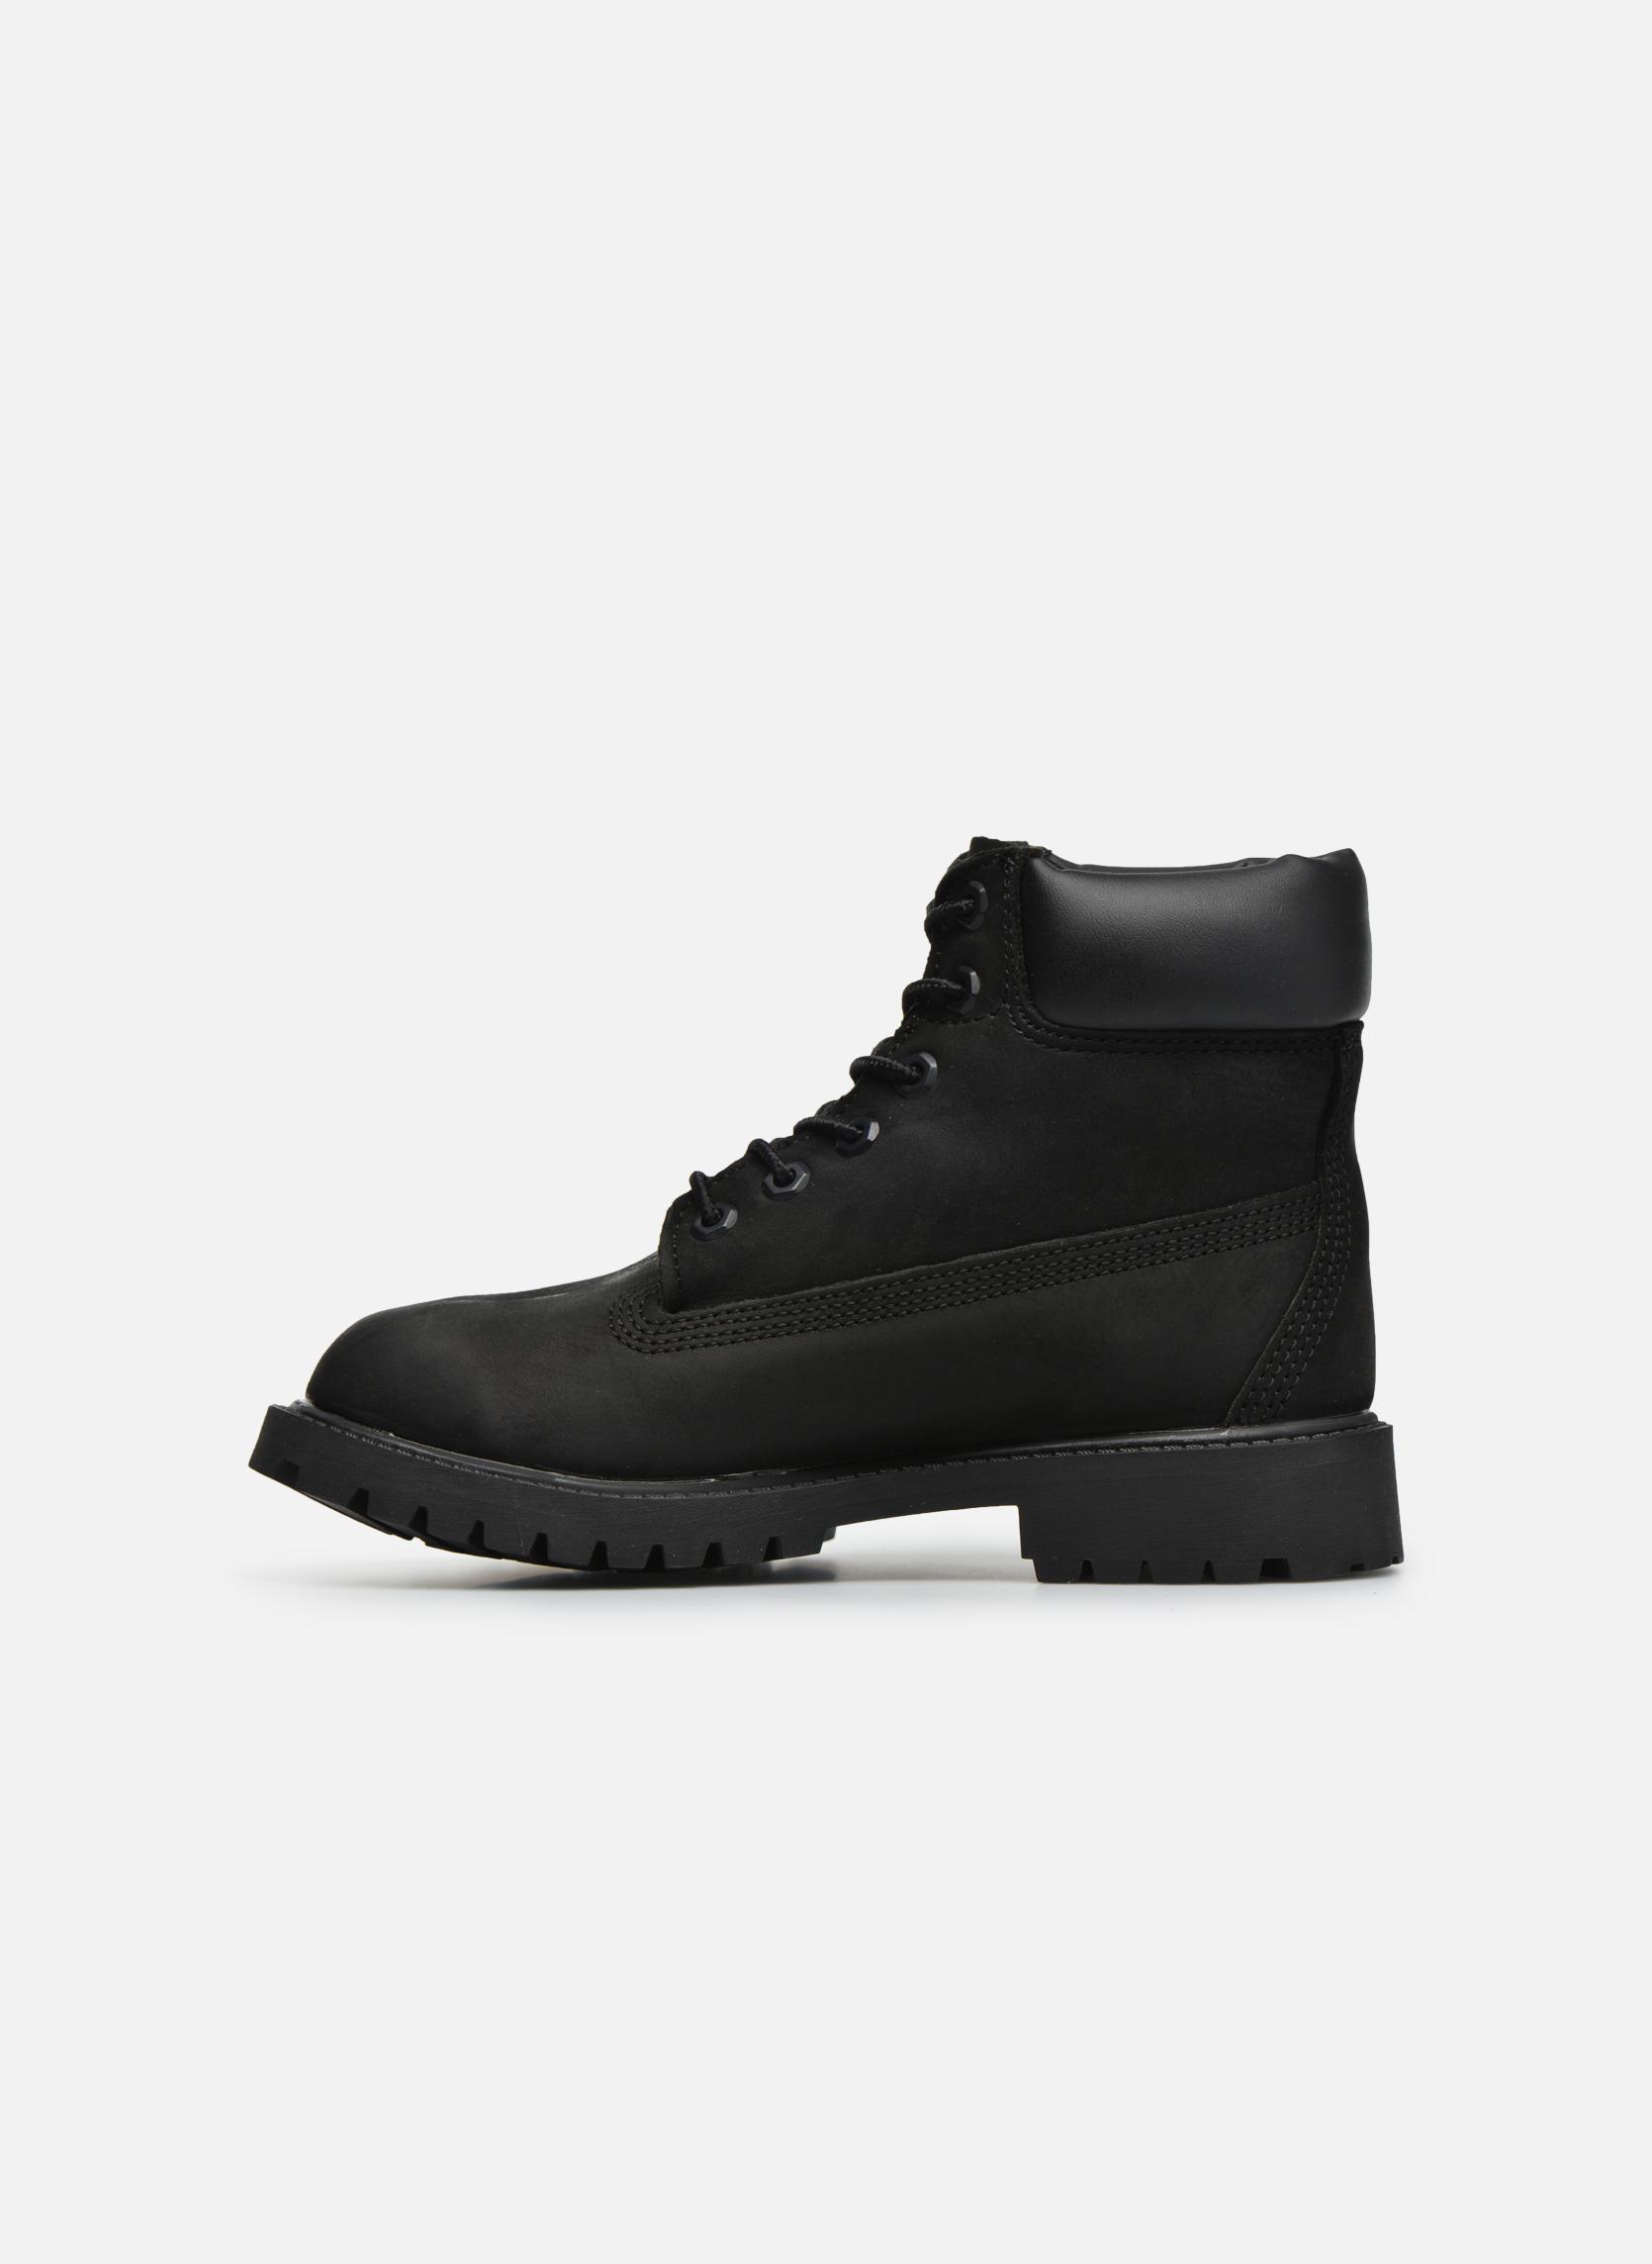 Bottines et boots Timberland 6 In Premium WP Boot Noir vue face